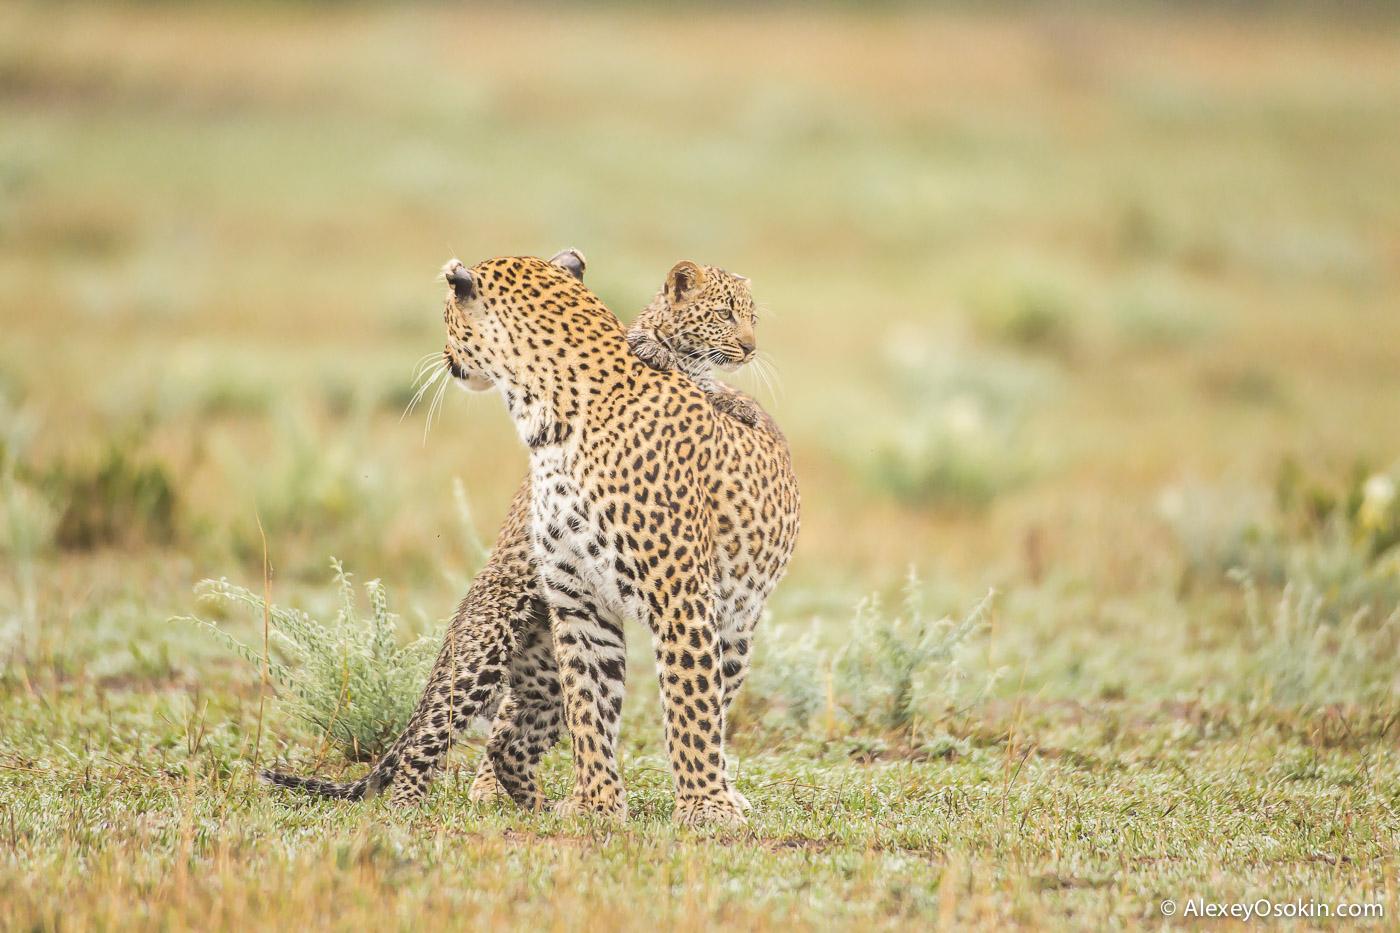 Leopard_lerean_poly_ao. oct.2015-13.jpg